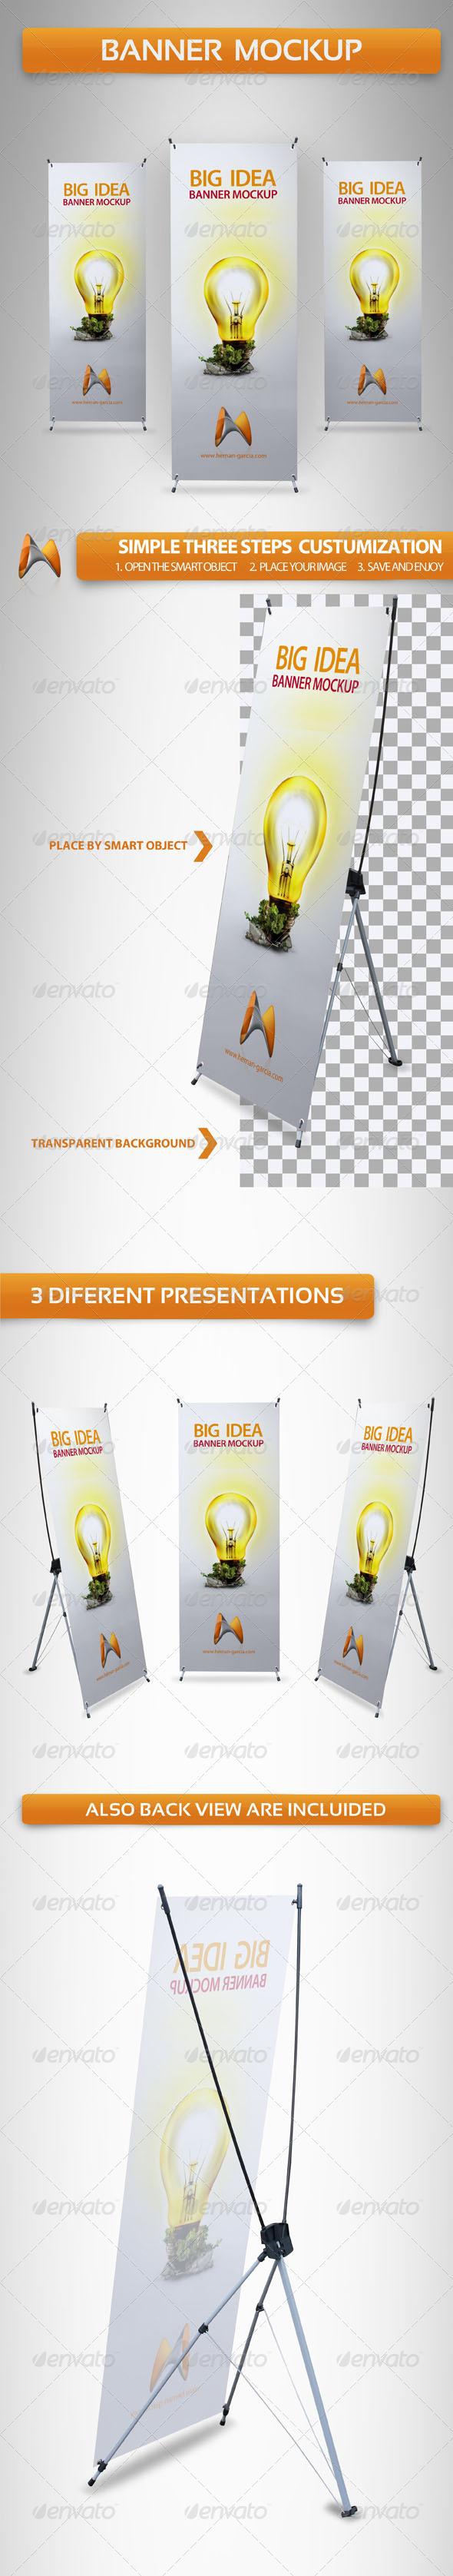 GraphicRiver X-Banner Mockup 3732915